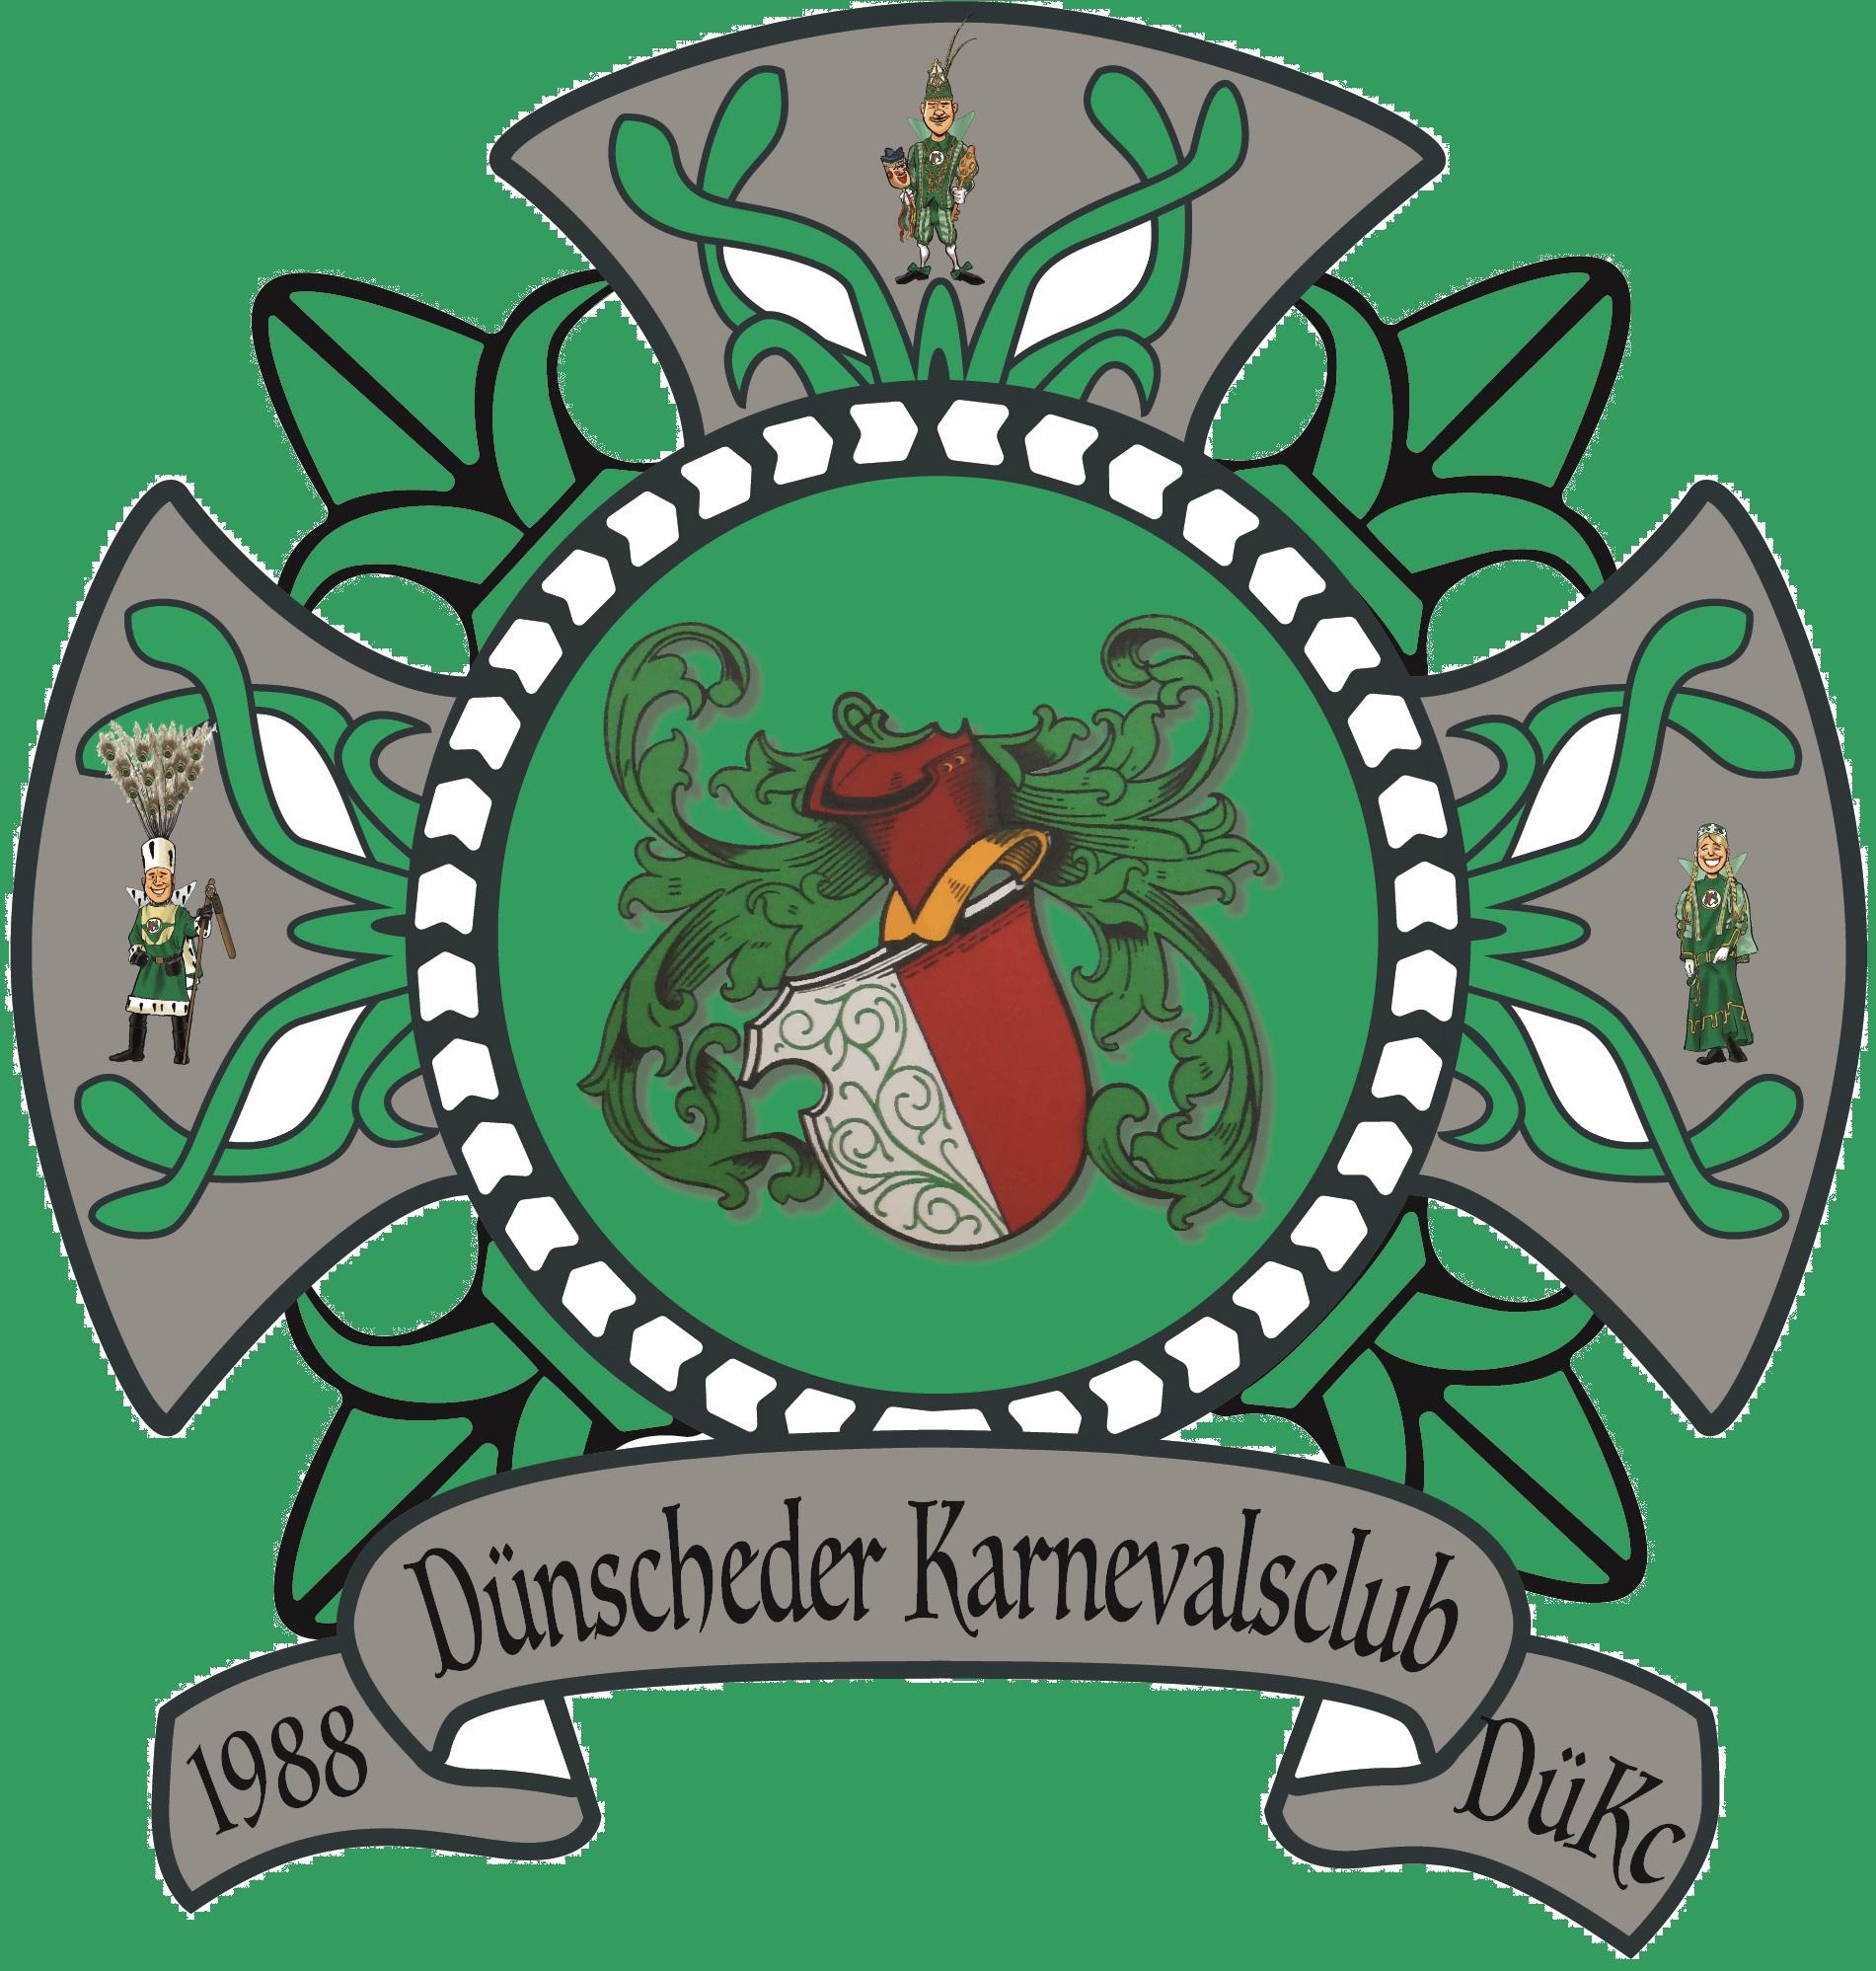 Dünscheder Karnevalsclub Logo